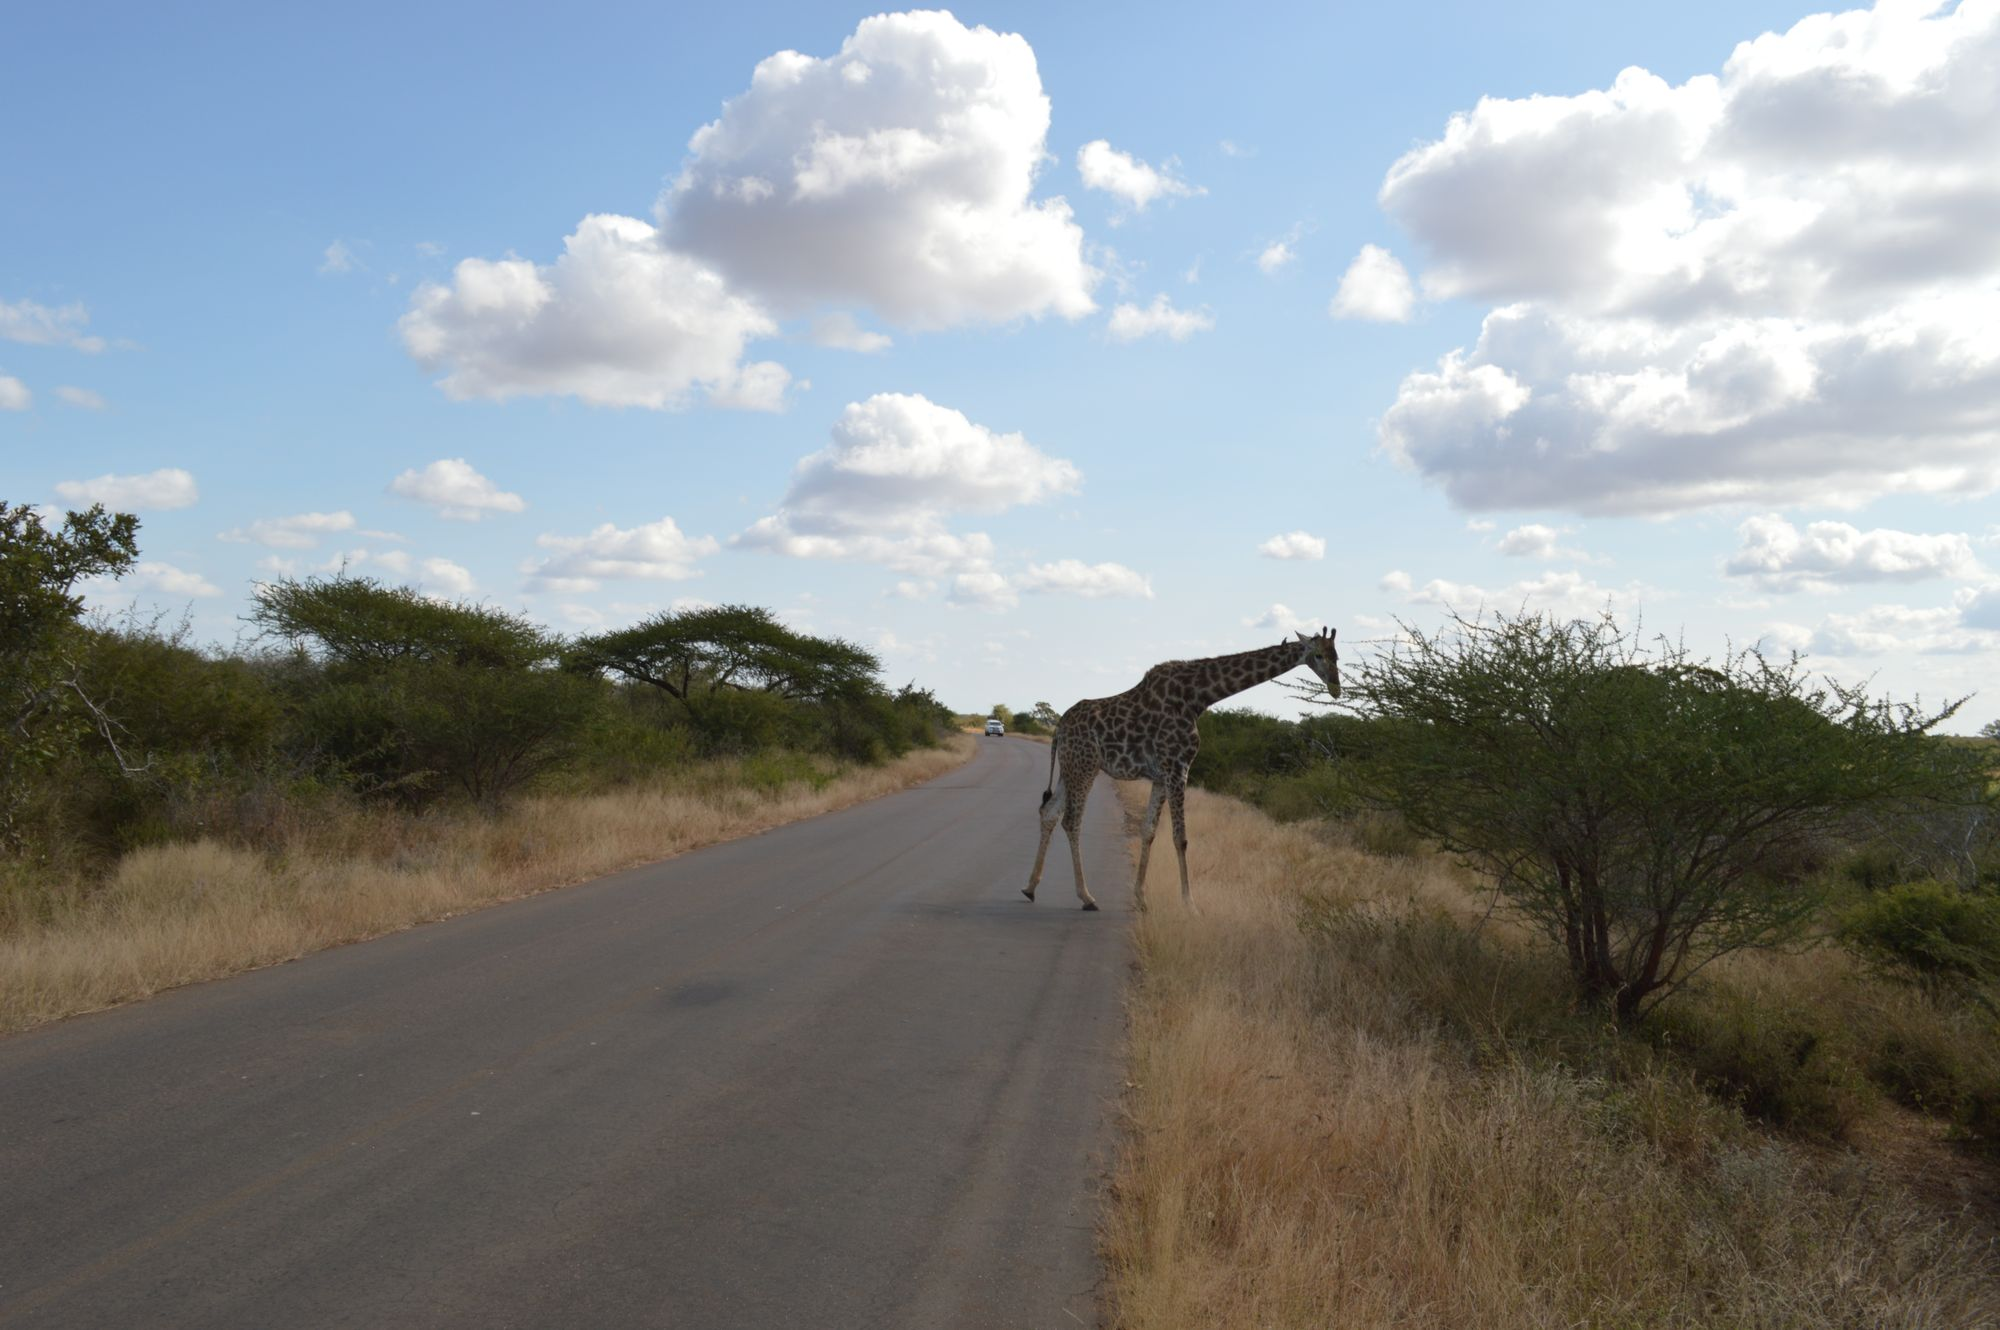 giraffe on the road